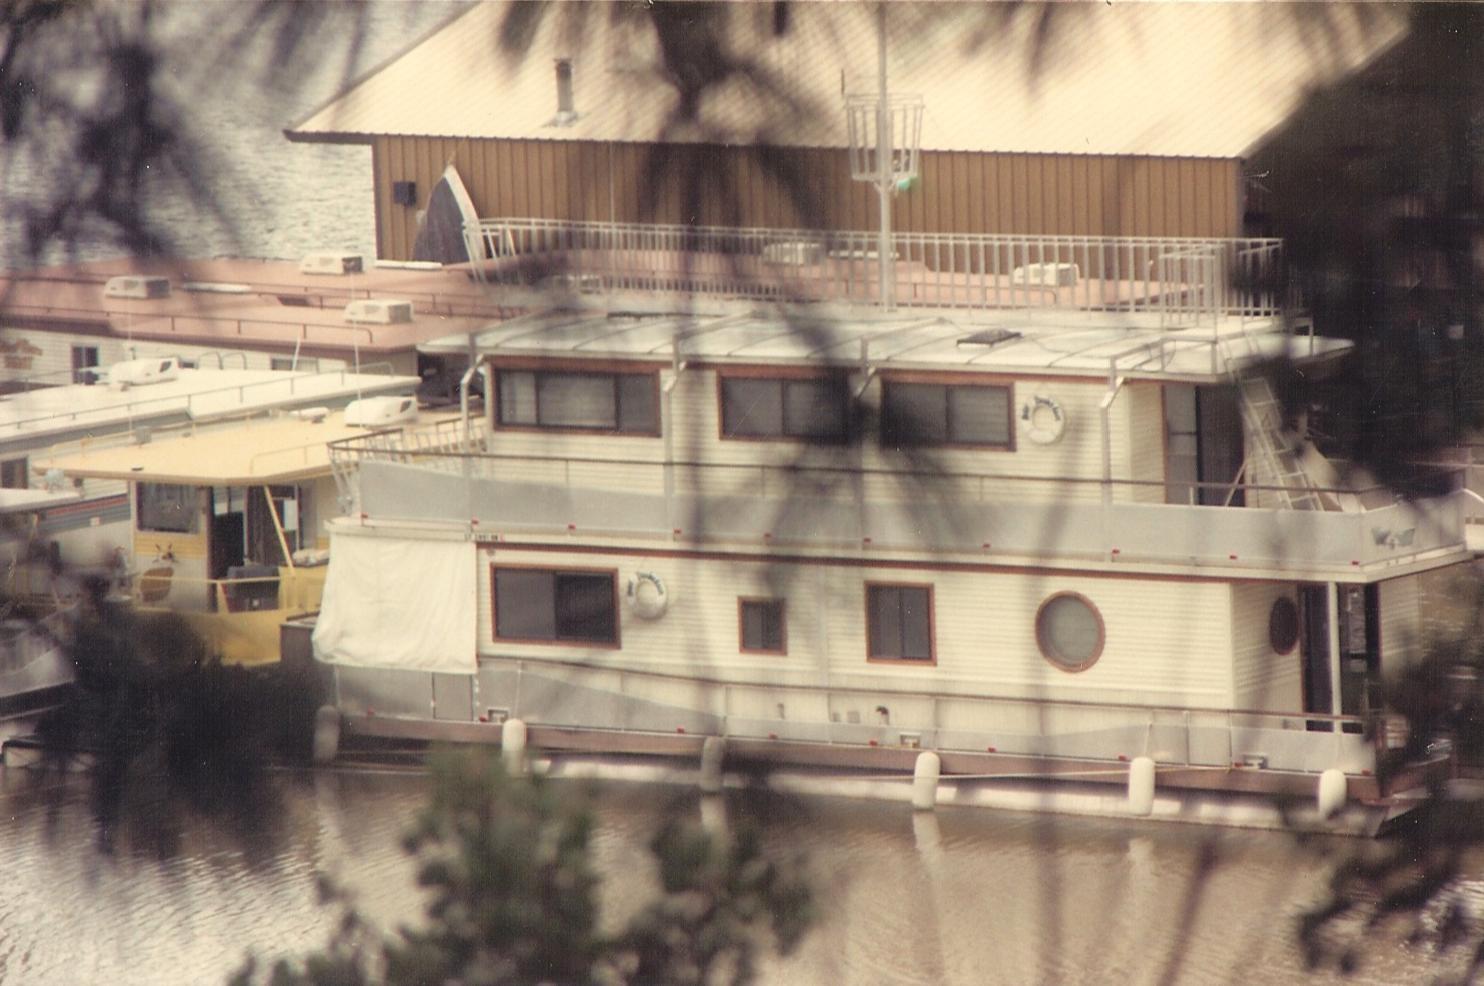 Trafficker Merle Haggard S Houseboat Hotel Troubador Lake Shasta California